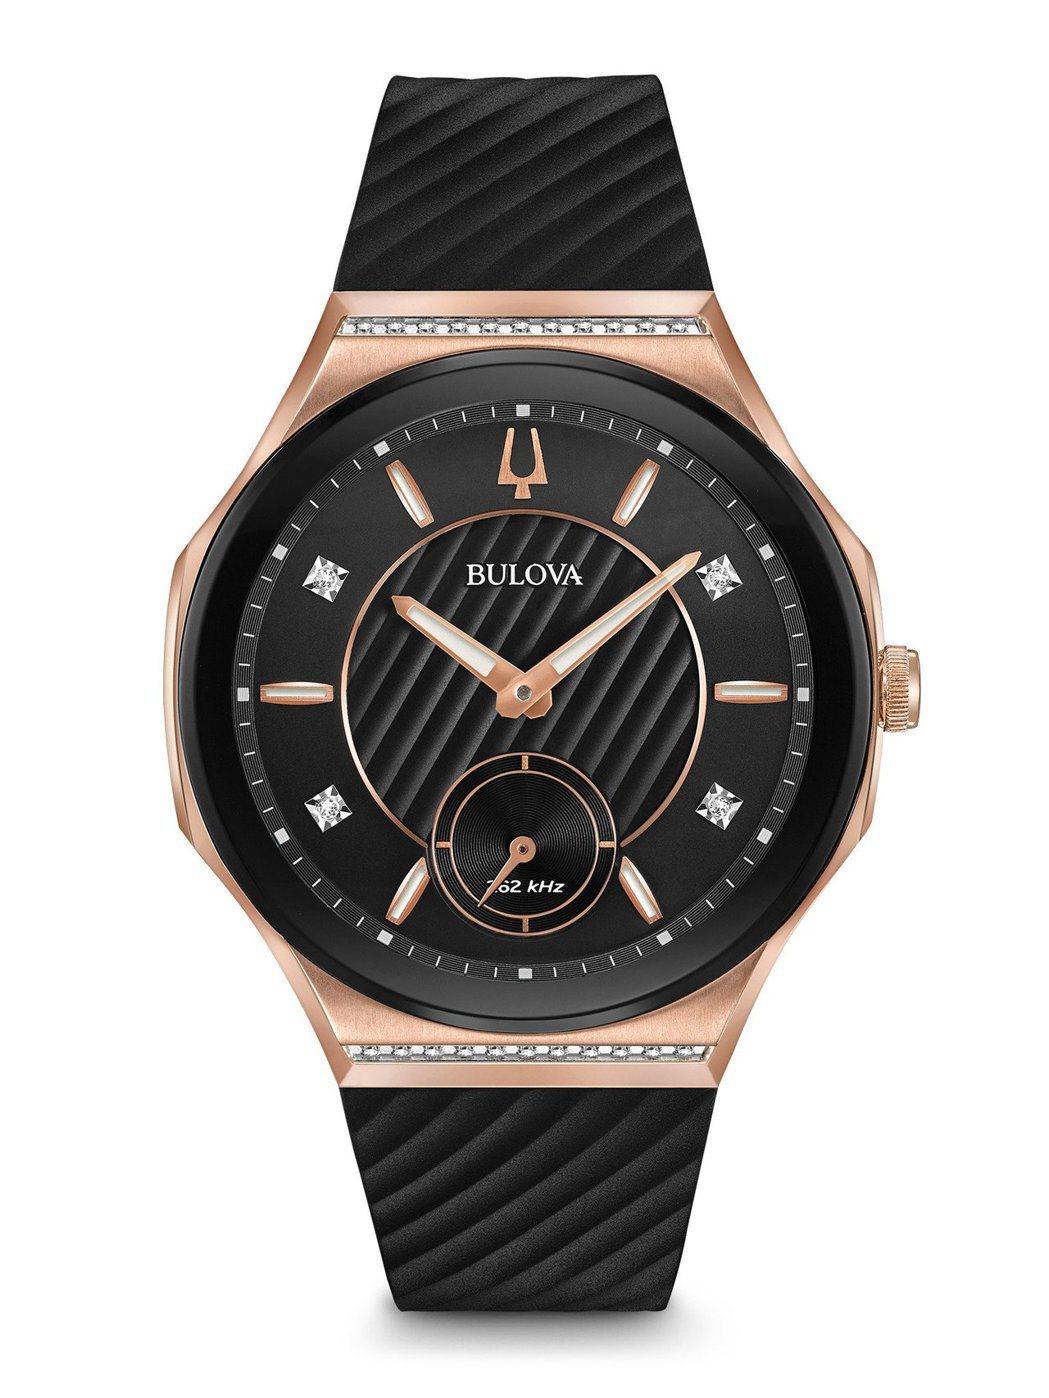 BULOVA Curv系列98R239腕表,不鏽鋼鍍玫瑰金表殼,約32,800元...